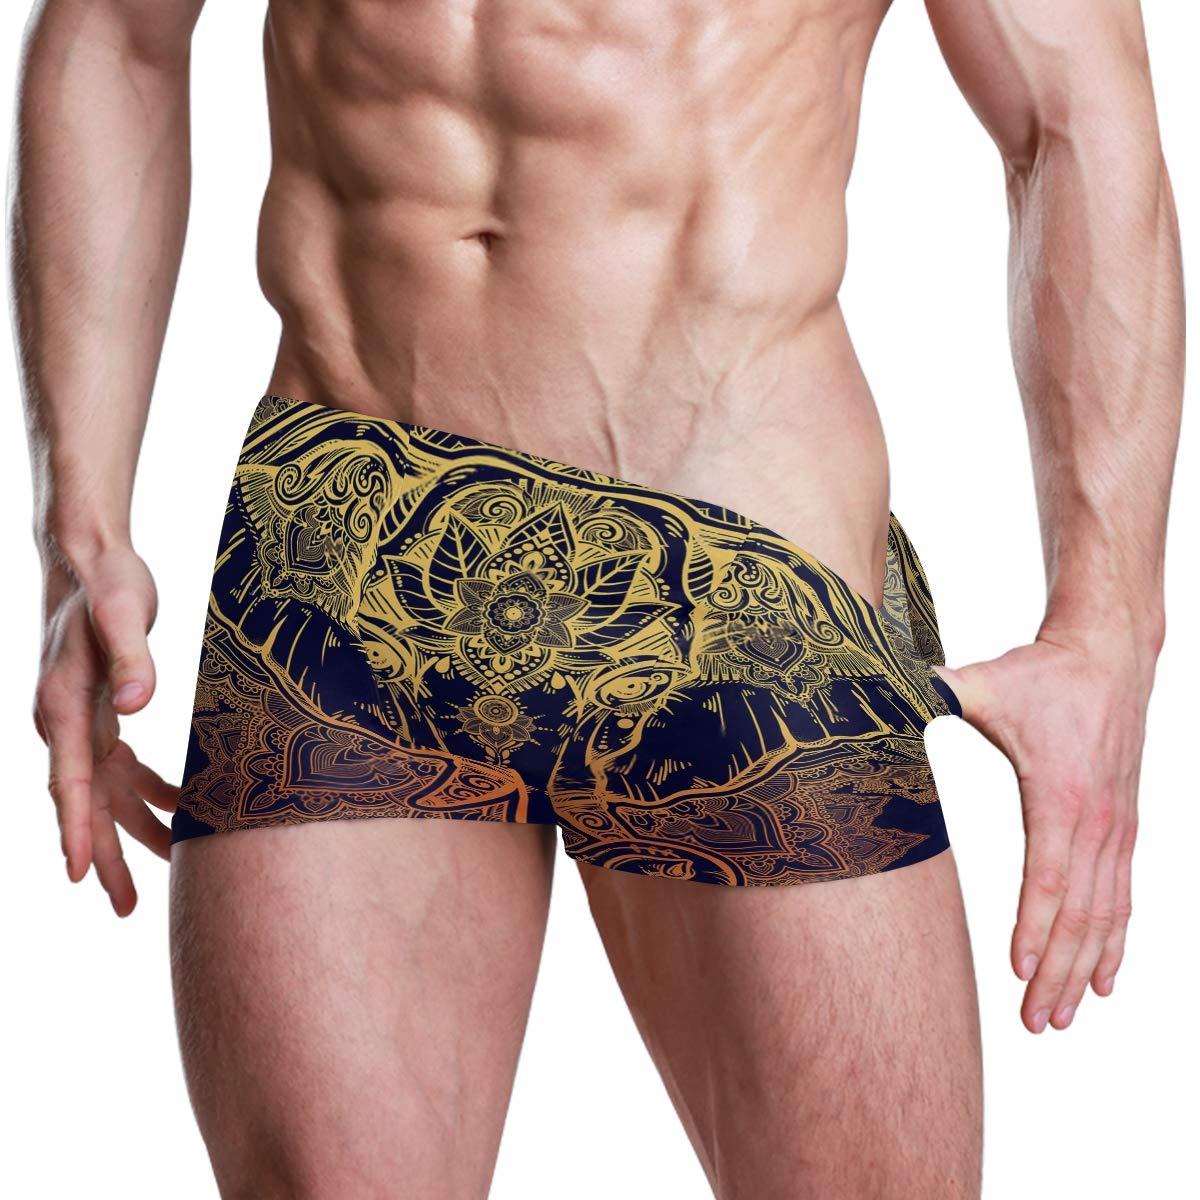 Floral Paisley Elephant Ethnic Mens Swimming Boxer Briefs Trunks Square Leg Swim Trunks Board Shorts